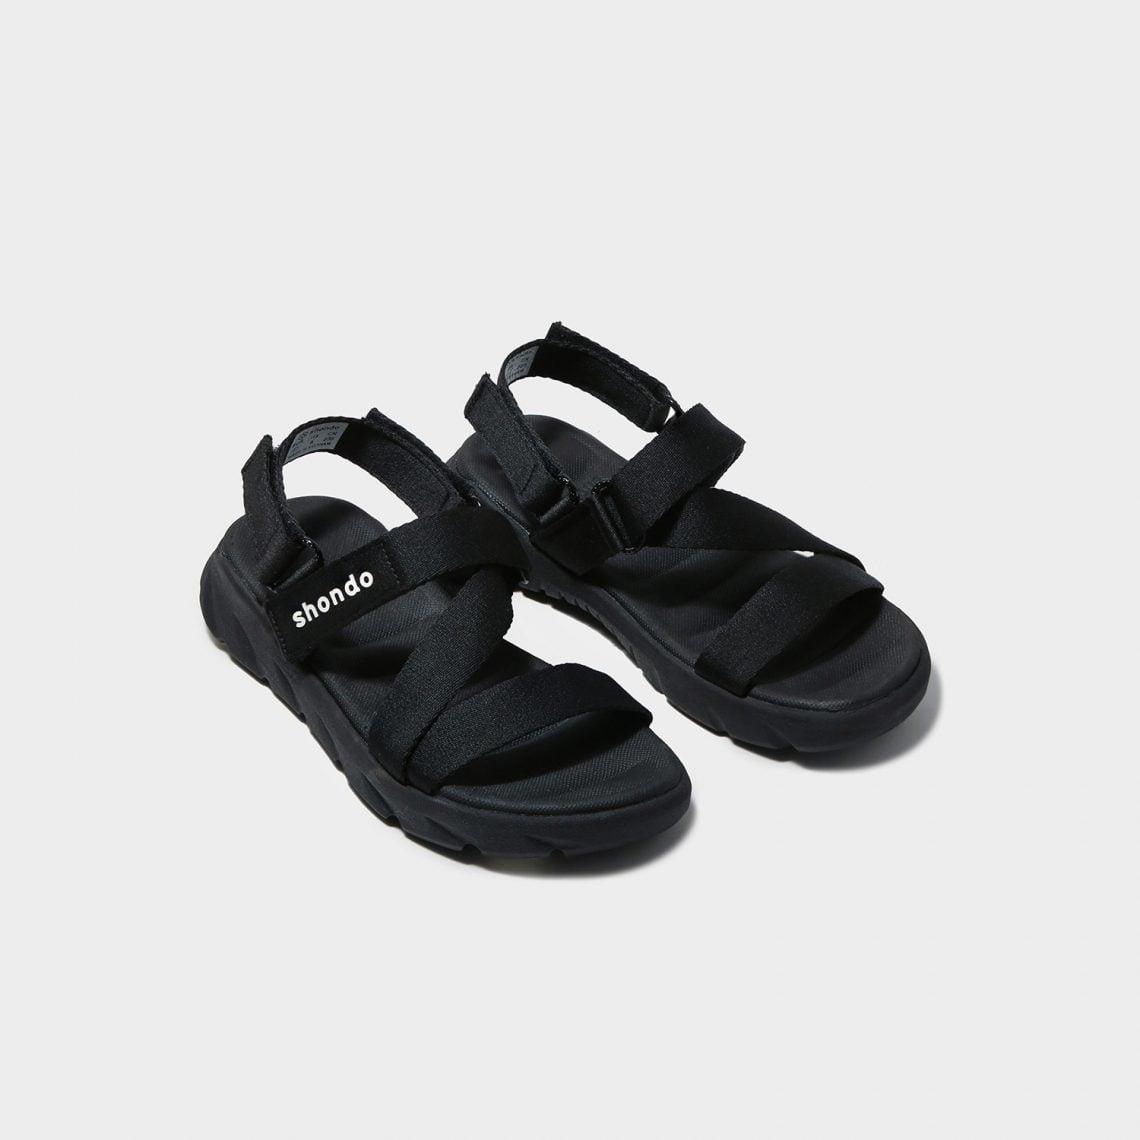 Giày Sandals Unisex SHONDO F6 Sport F6S301 2